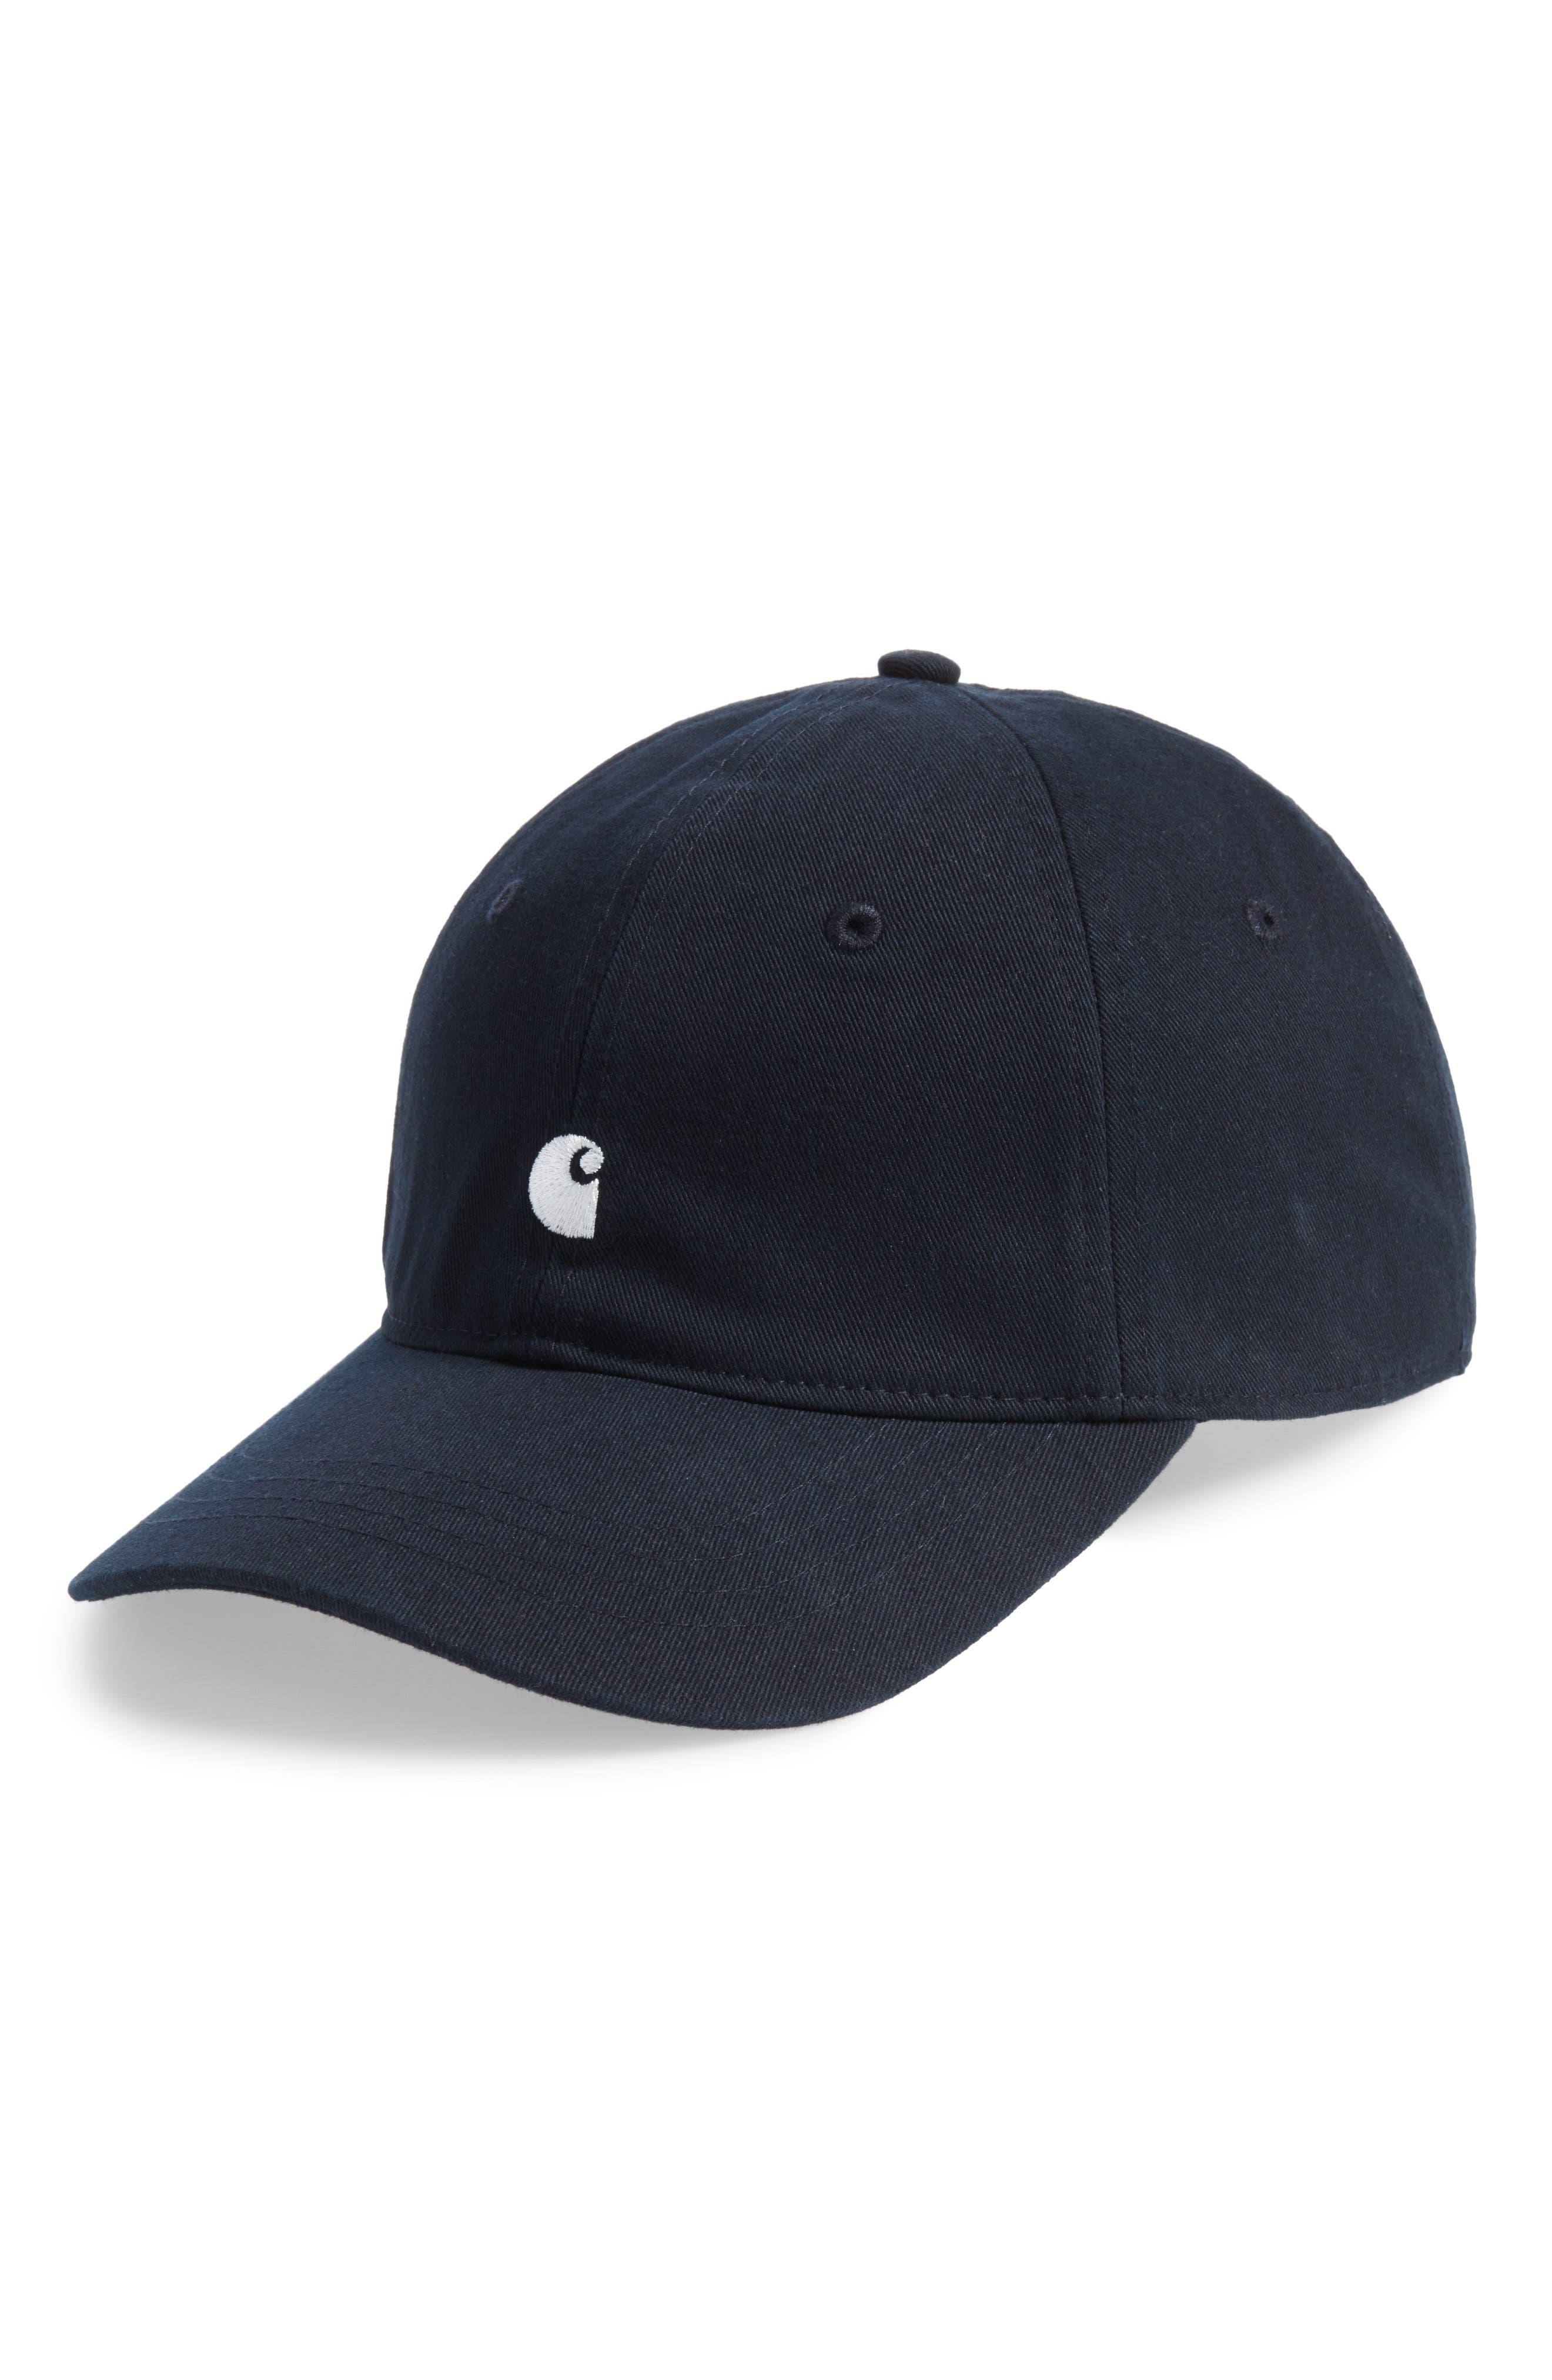 Madison Baseball Cap,                         Main,                         color, 1C00-Dark Navy/Black